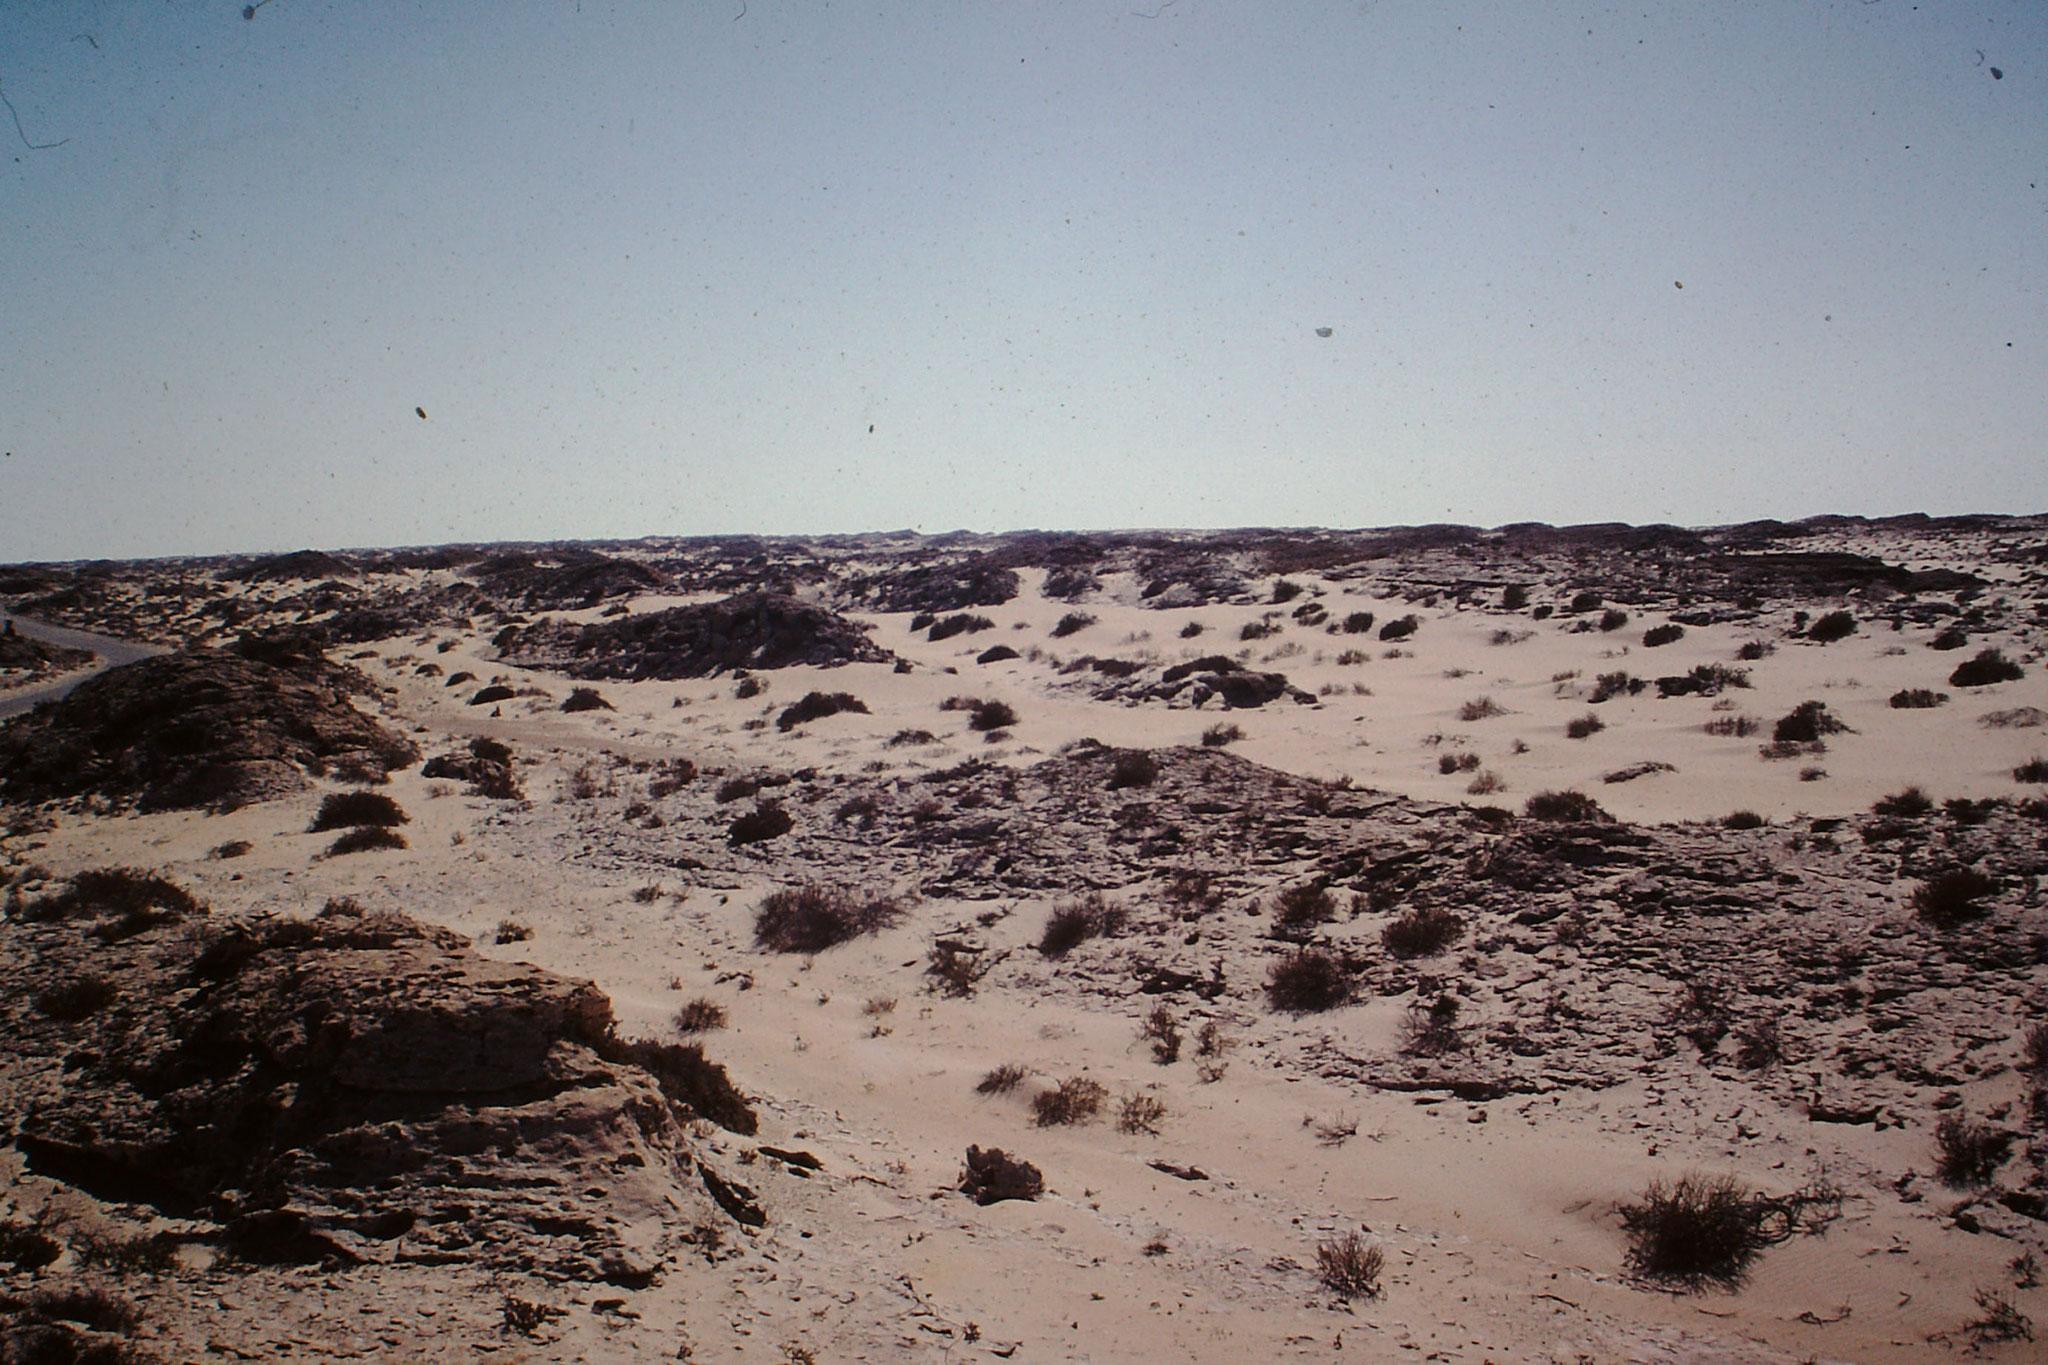 Landschaft in Westsahara.